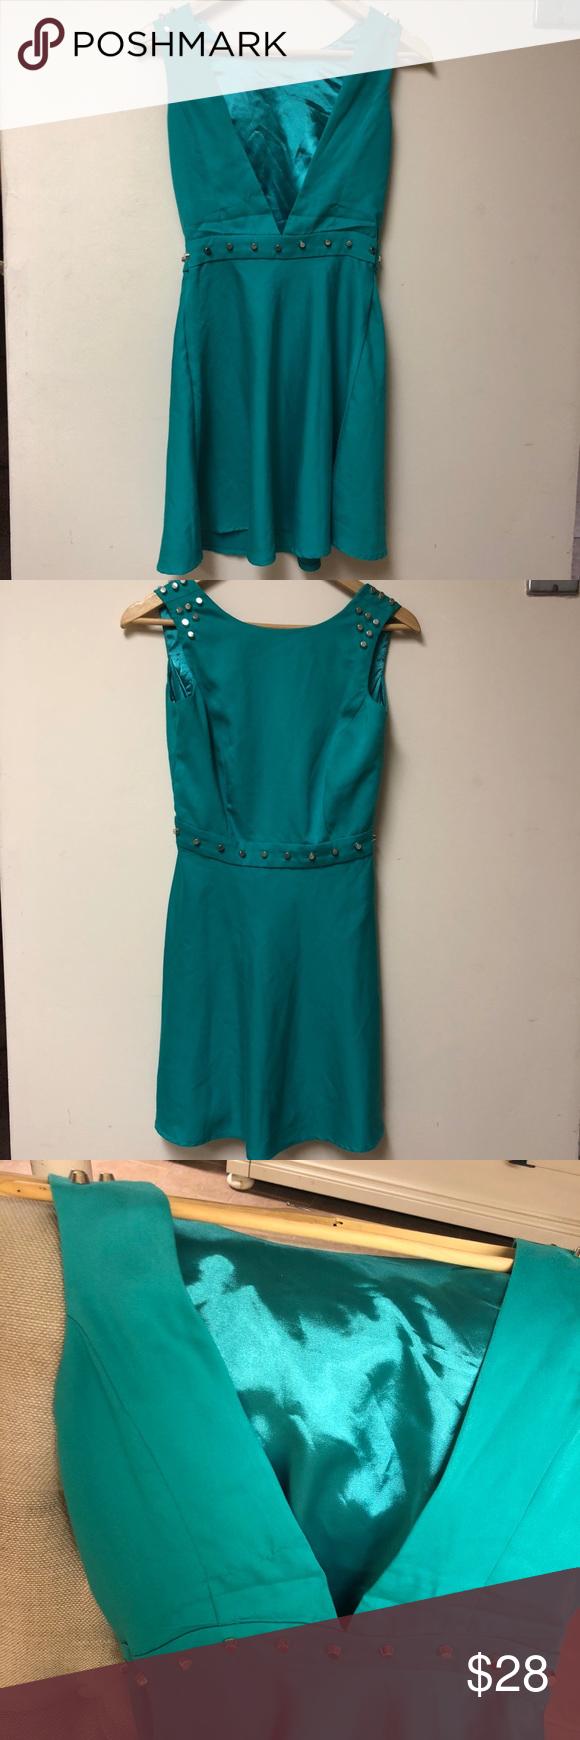 Studd deep v dress body shapes blue green and shapes